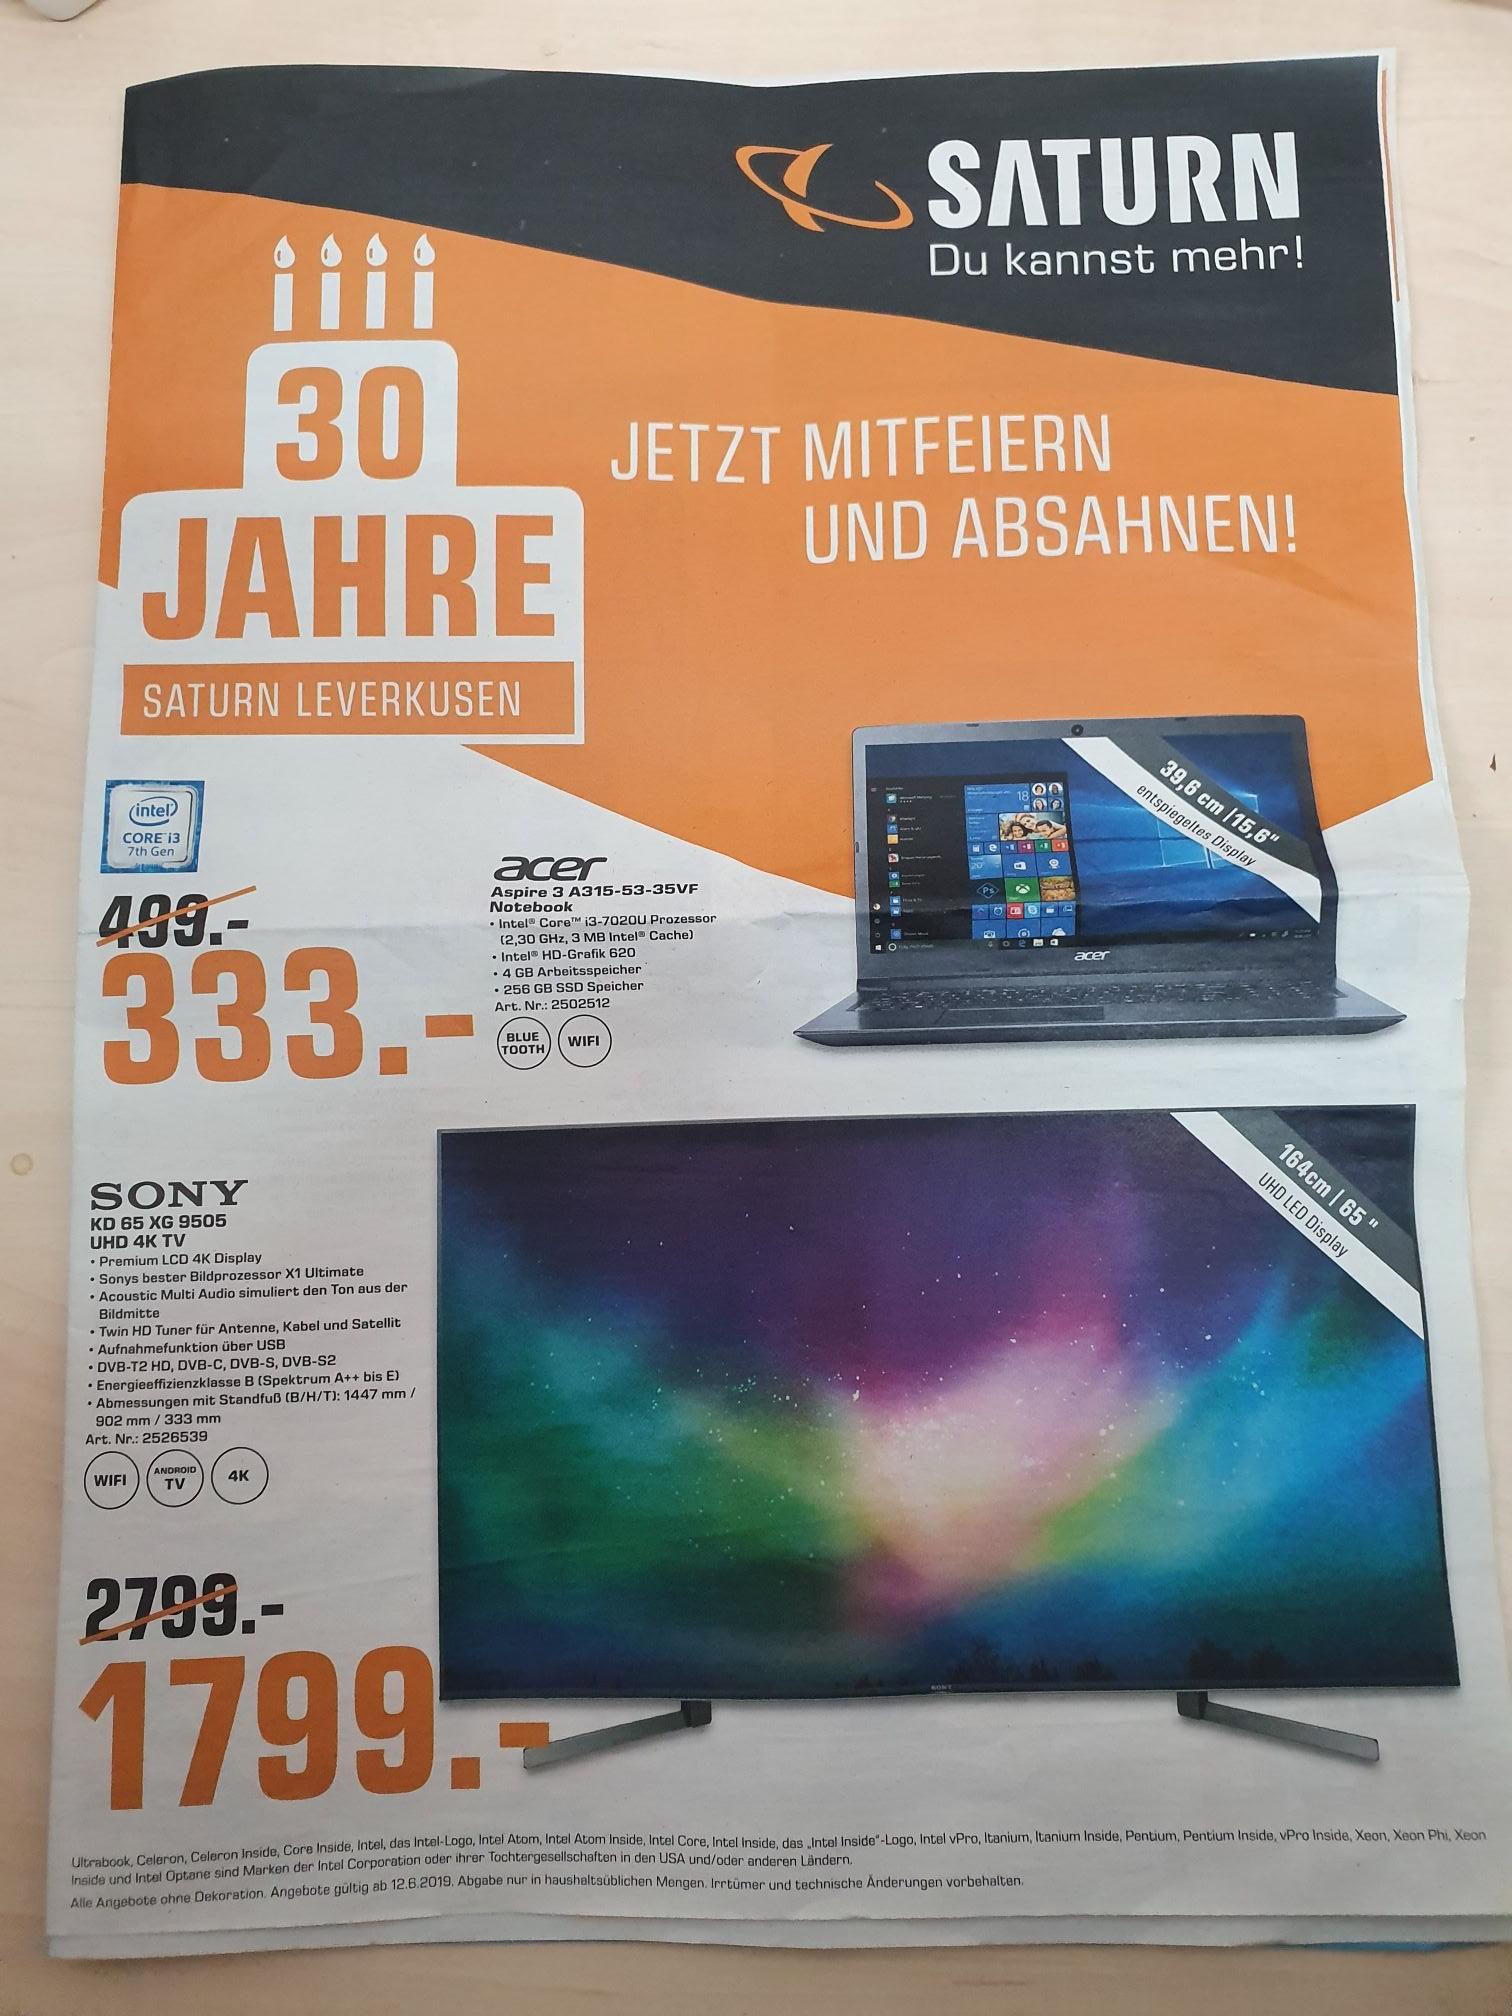 (Lokal) Saturn Leverkusen Geburtstagsangebote Sony KD 65 XG 9505, LG OLED 65 B8, Bose Soundlink mini II und weiteres